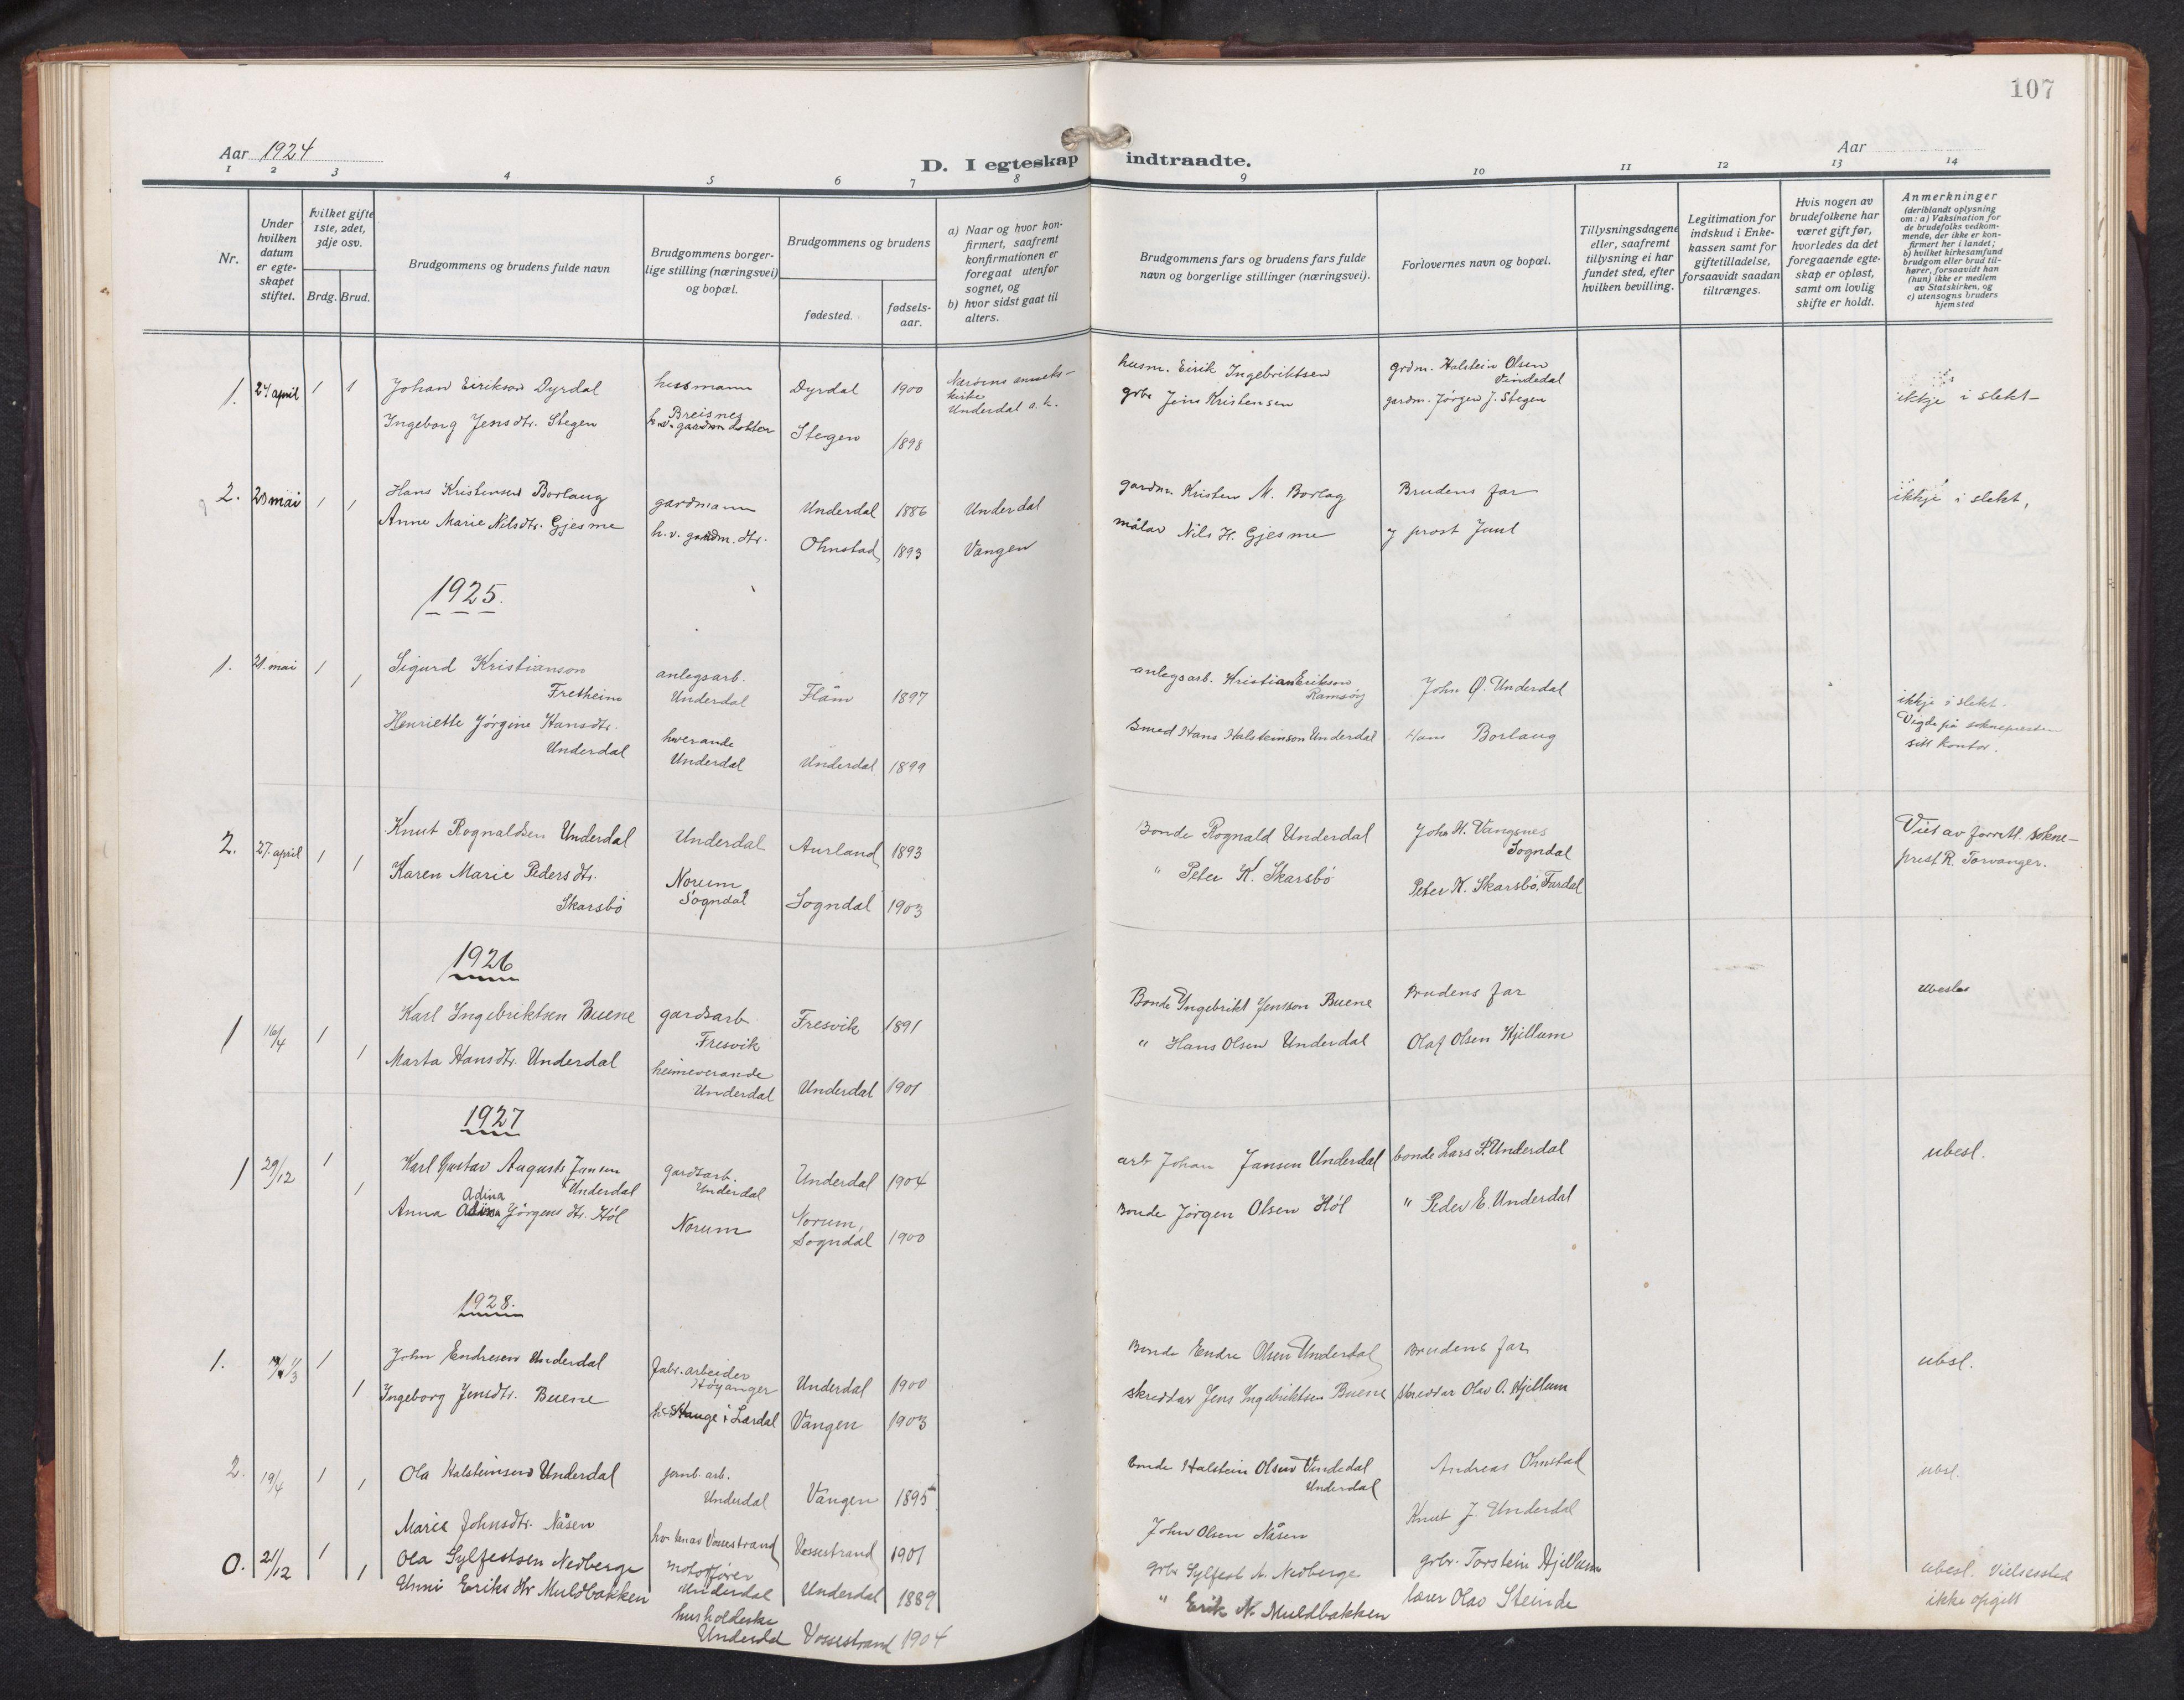 SAB, Aurland sokneprestembete, H/Hb/Hbd/L0003: Klokkerbok nr. D 3, 1920-1968, s. 106b-107a